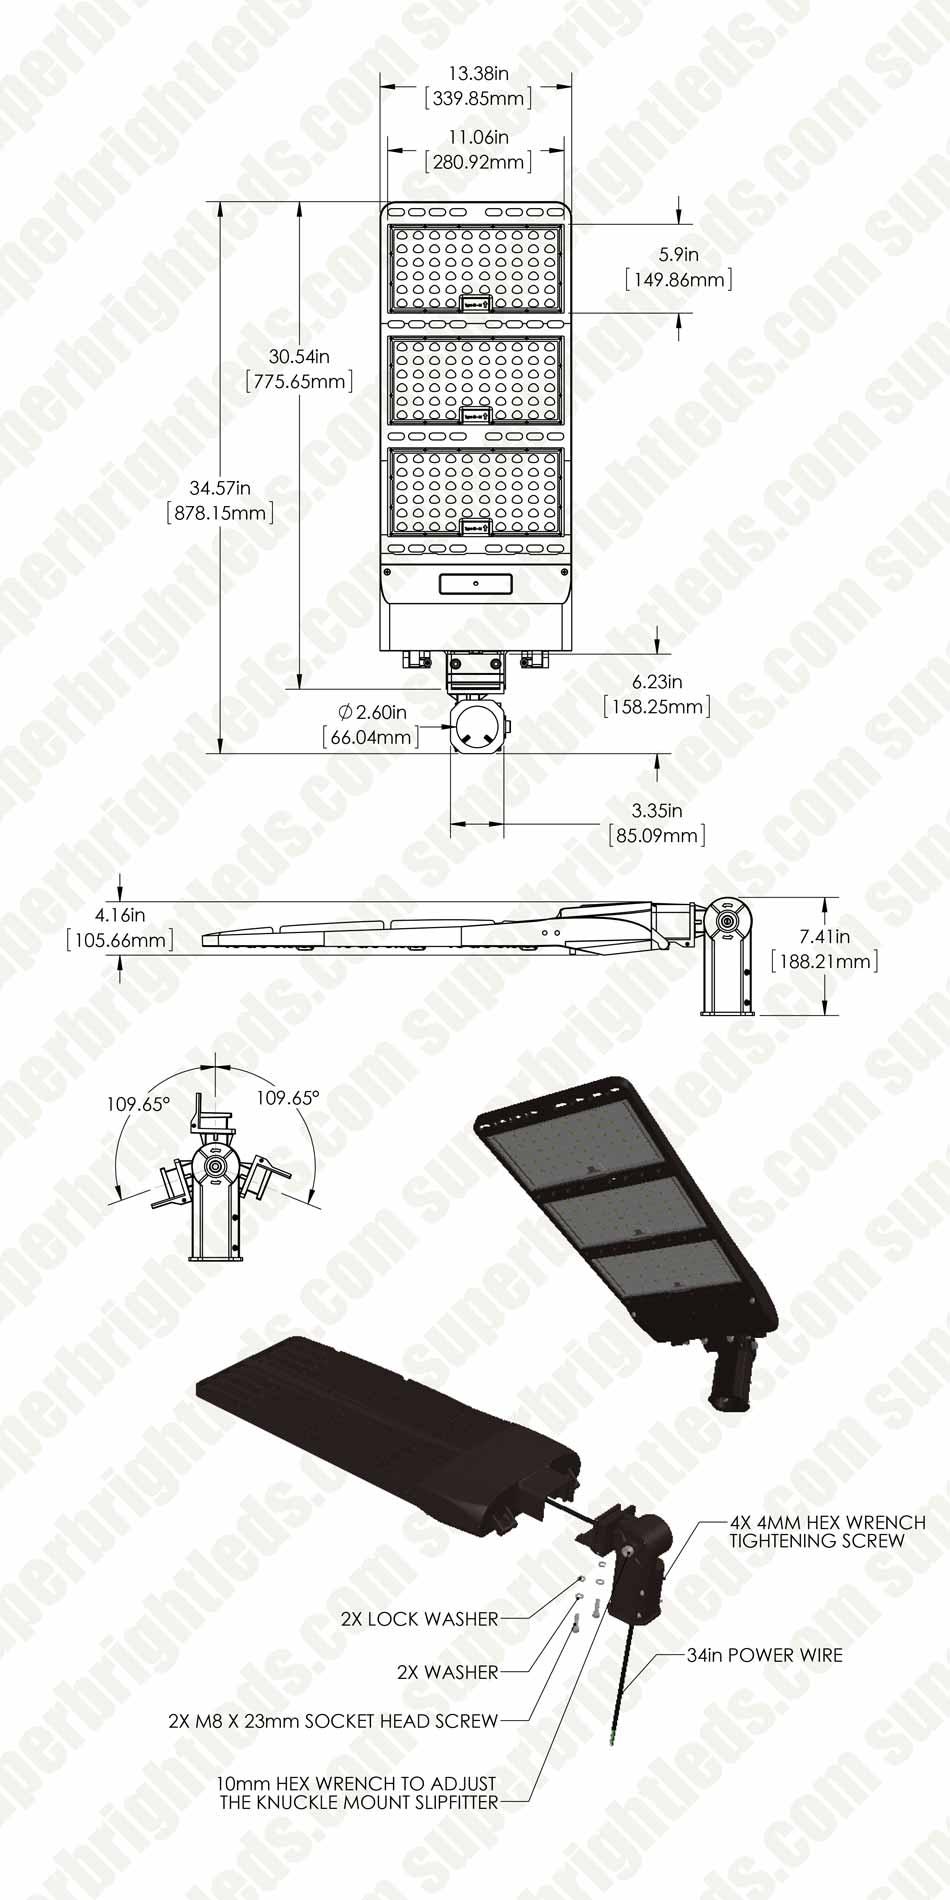 400W LED Parking Lot/Shoebox Area Light - 200-480V - 56,000 Lumens  W V Wiring Diagram on